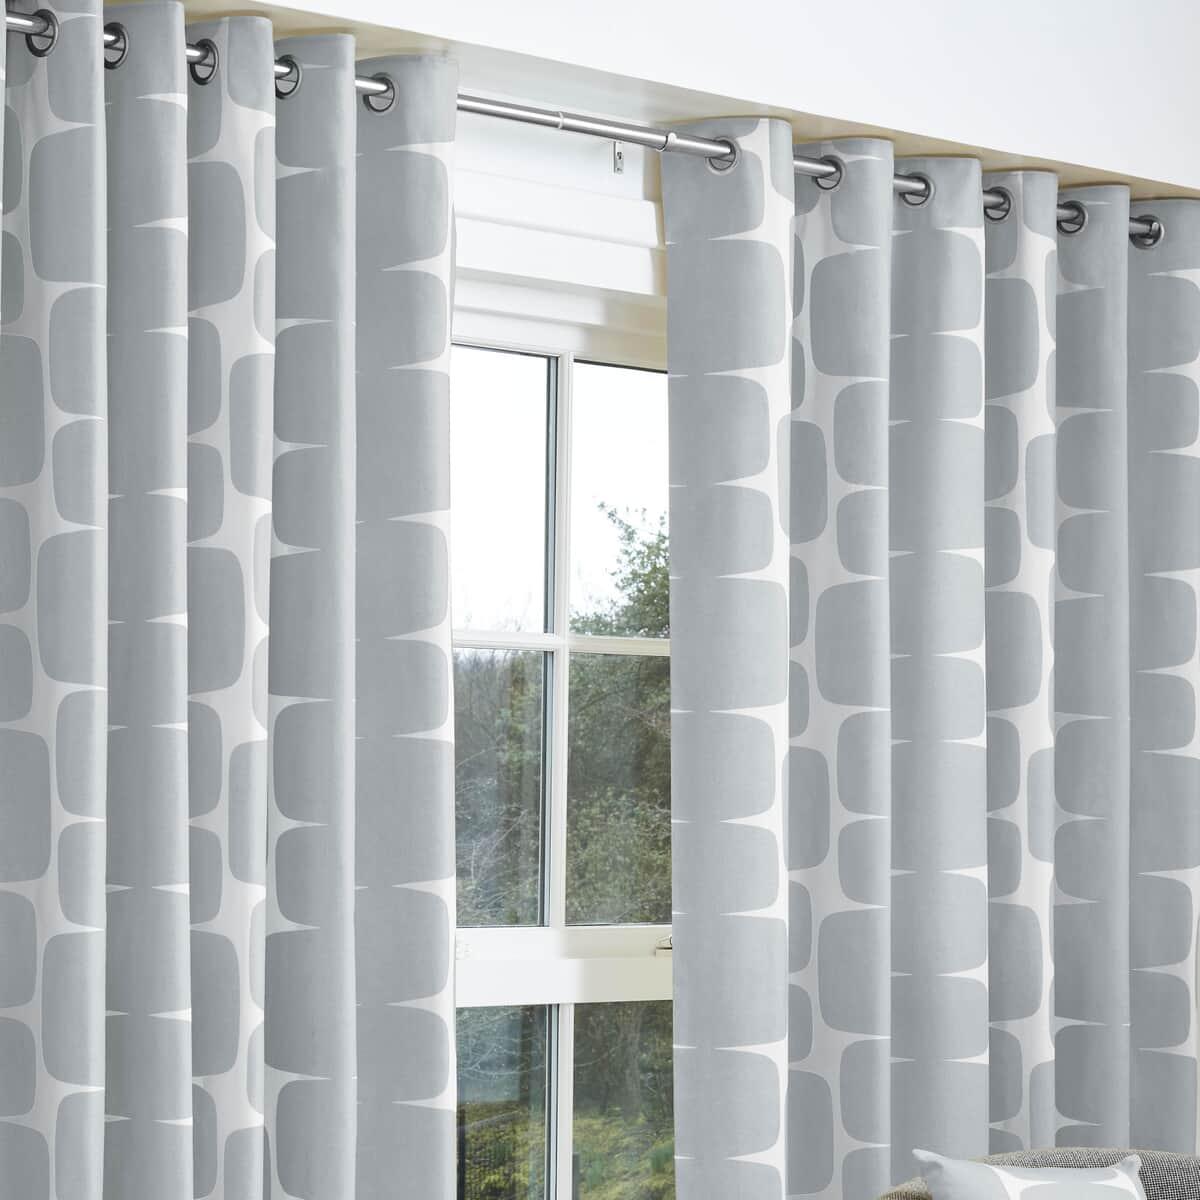 Scion Curtains Lohko Curtains Silver large